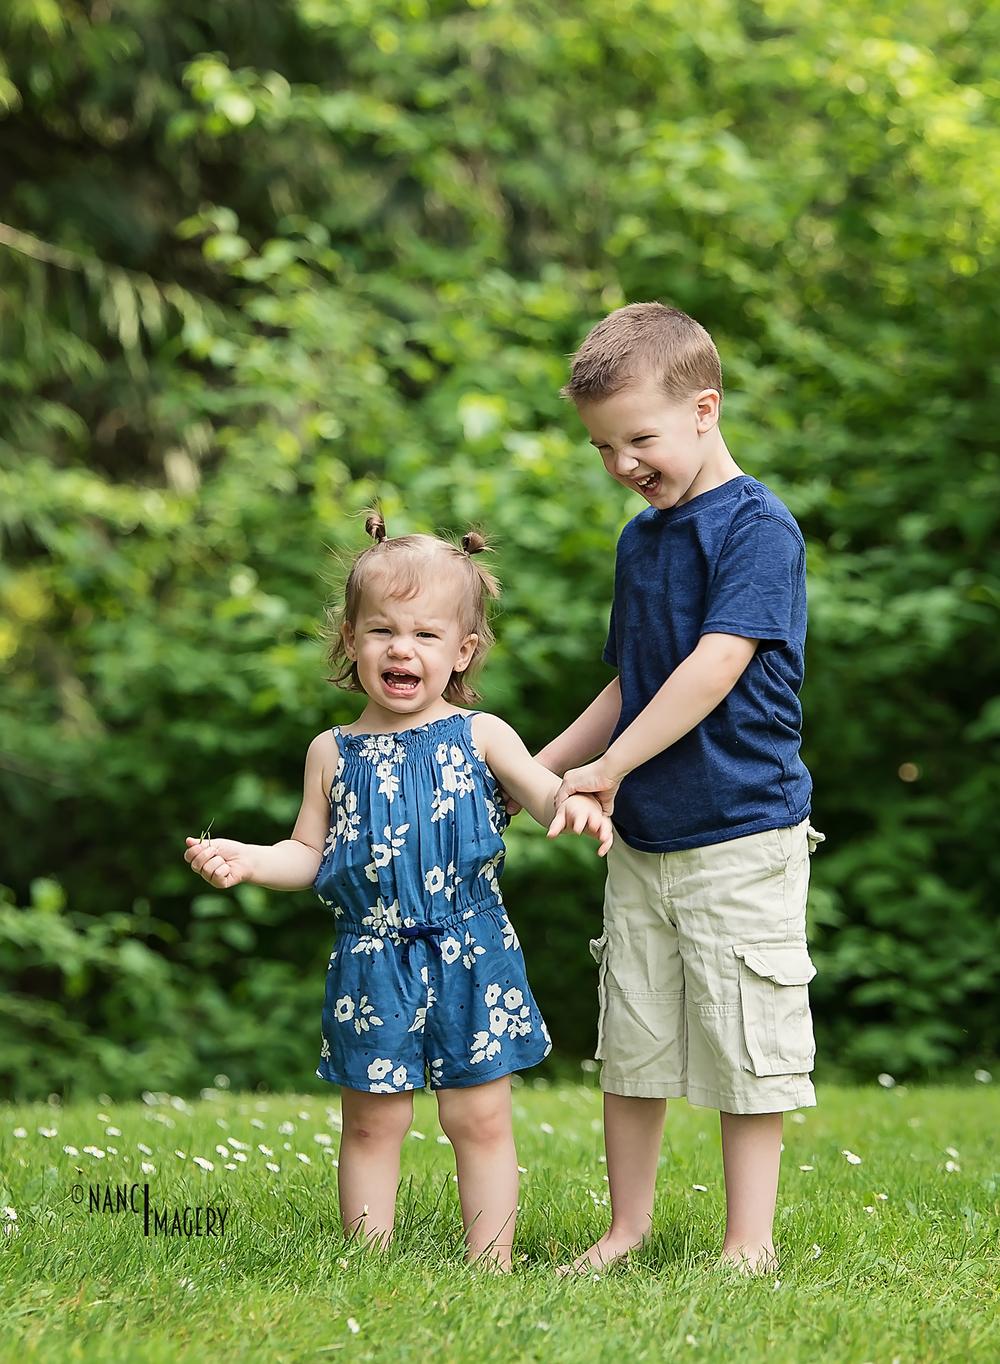 Sibling love, Nanci Imagery